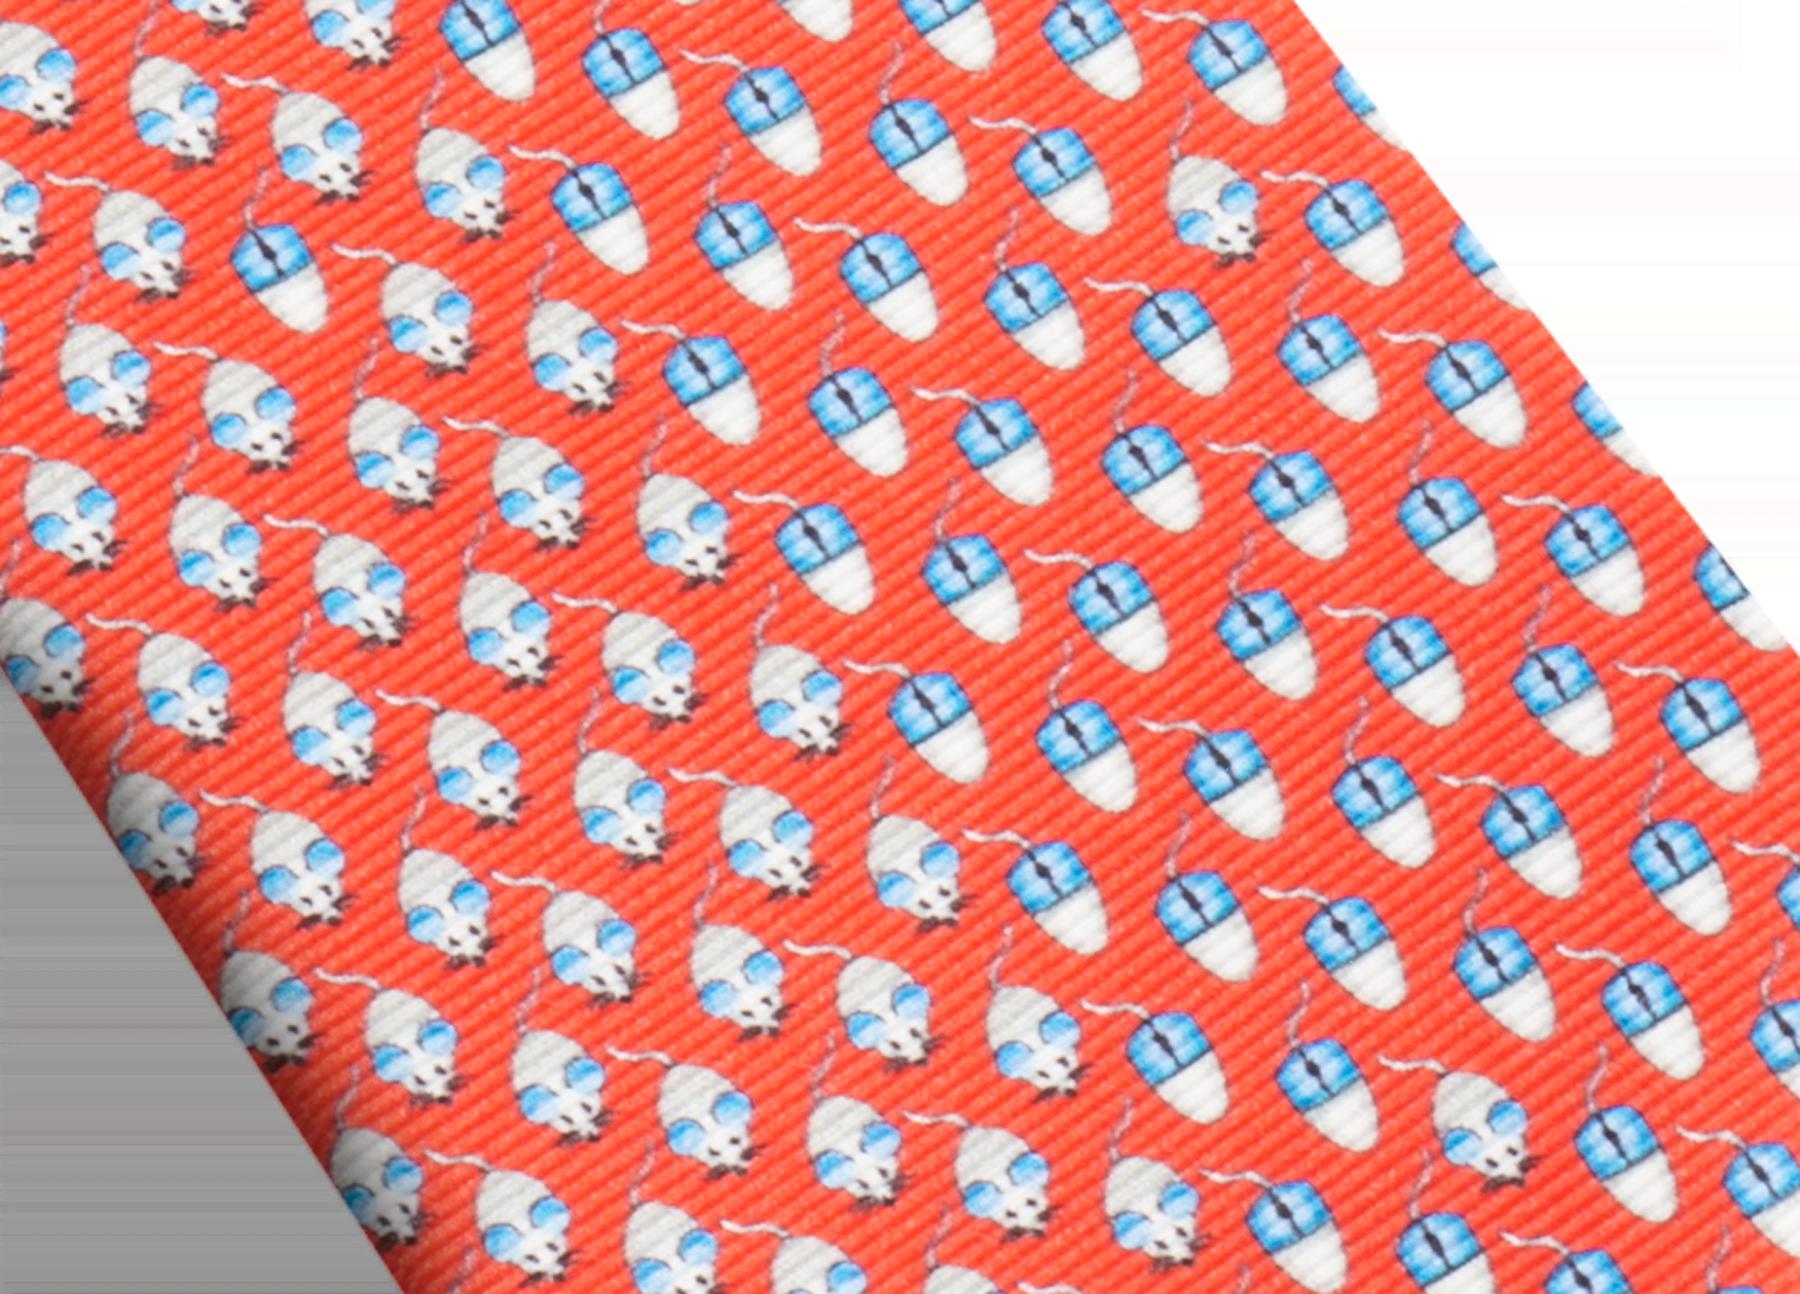 Red Mouse Click pattern seven-fold tie in fine saglione printed silk. 244206 image 2